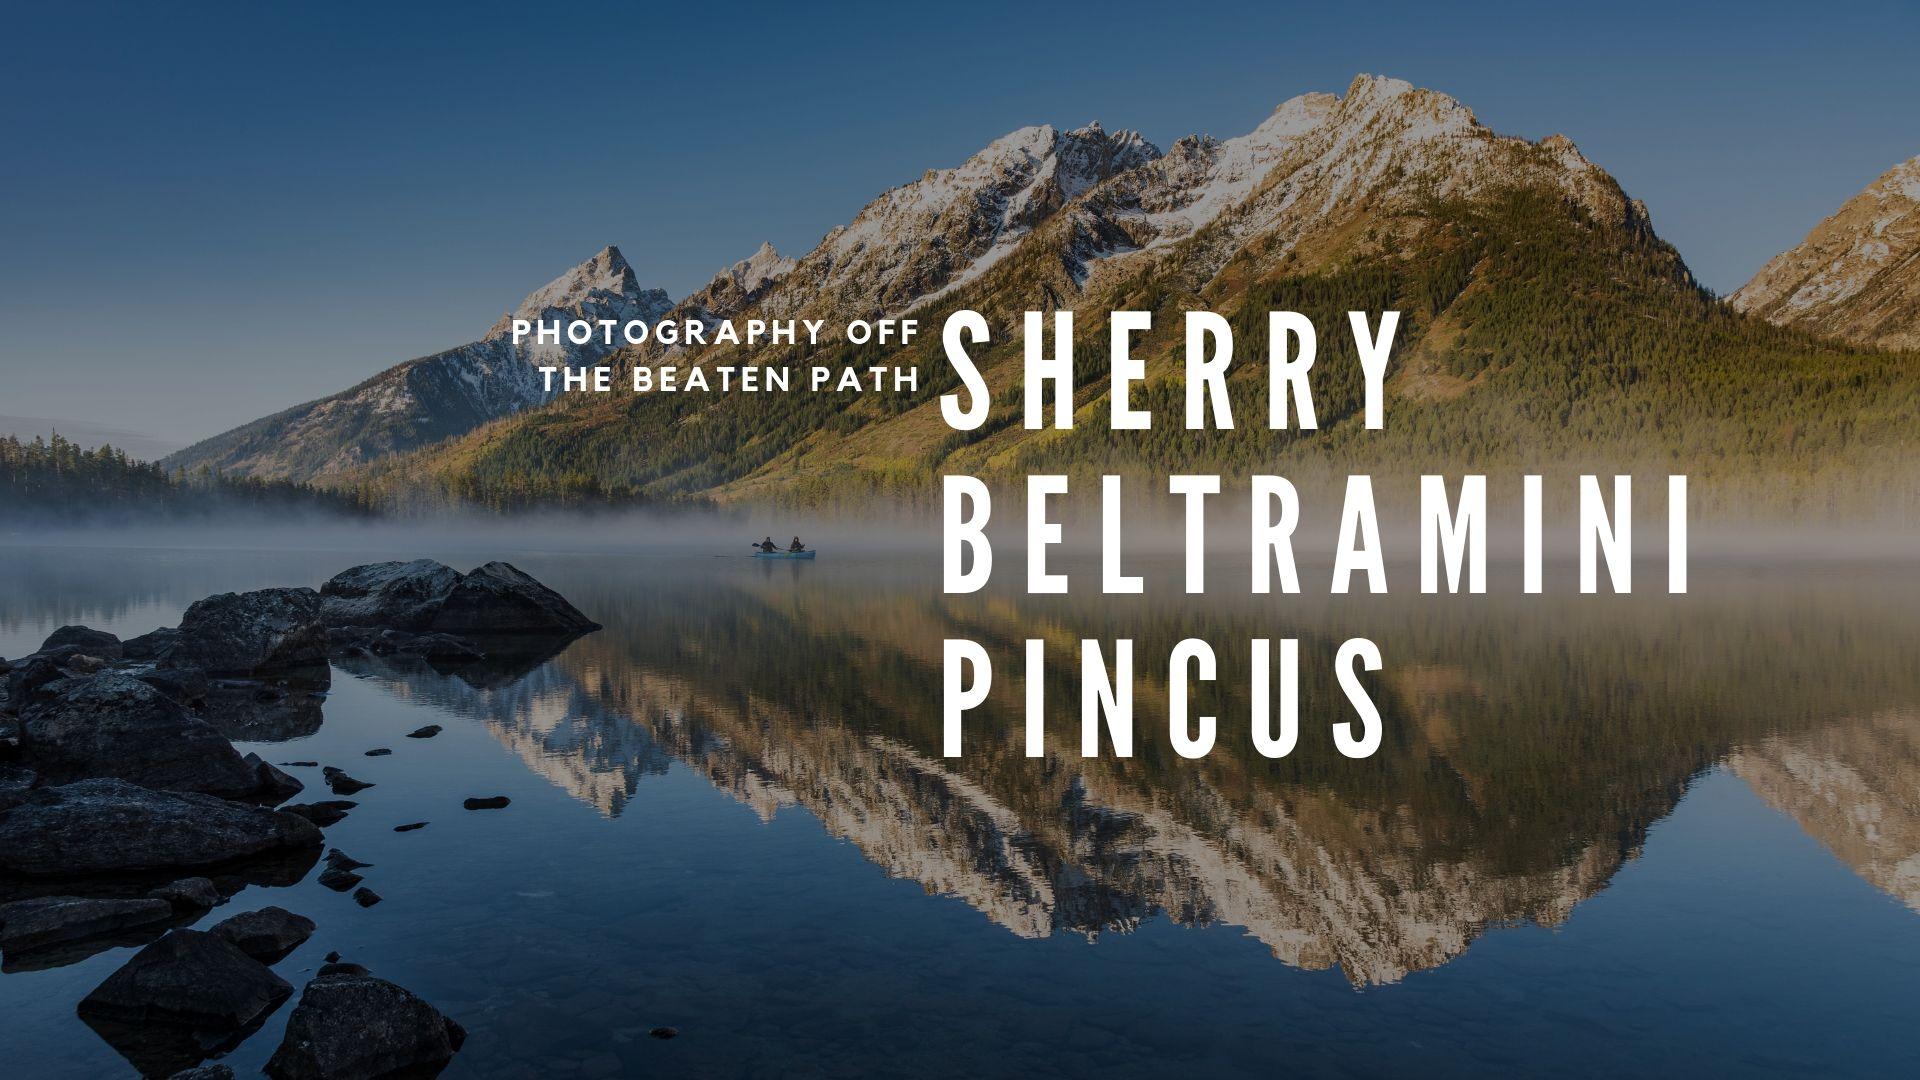 Sherry Beltramini Pincus.jpg